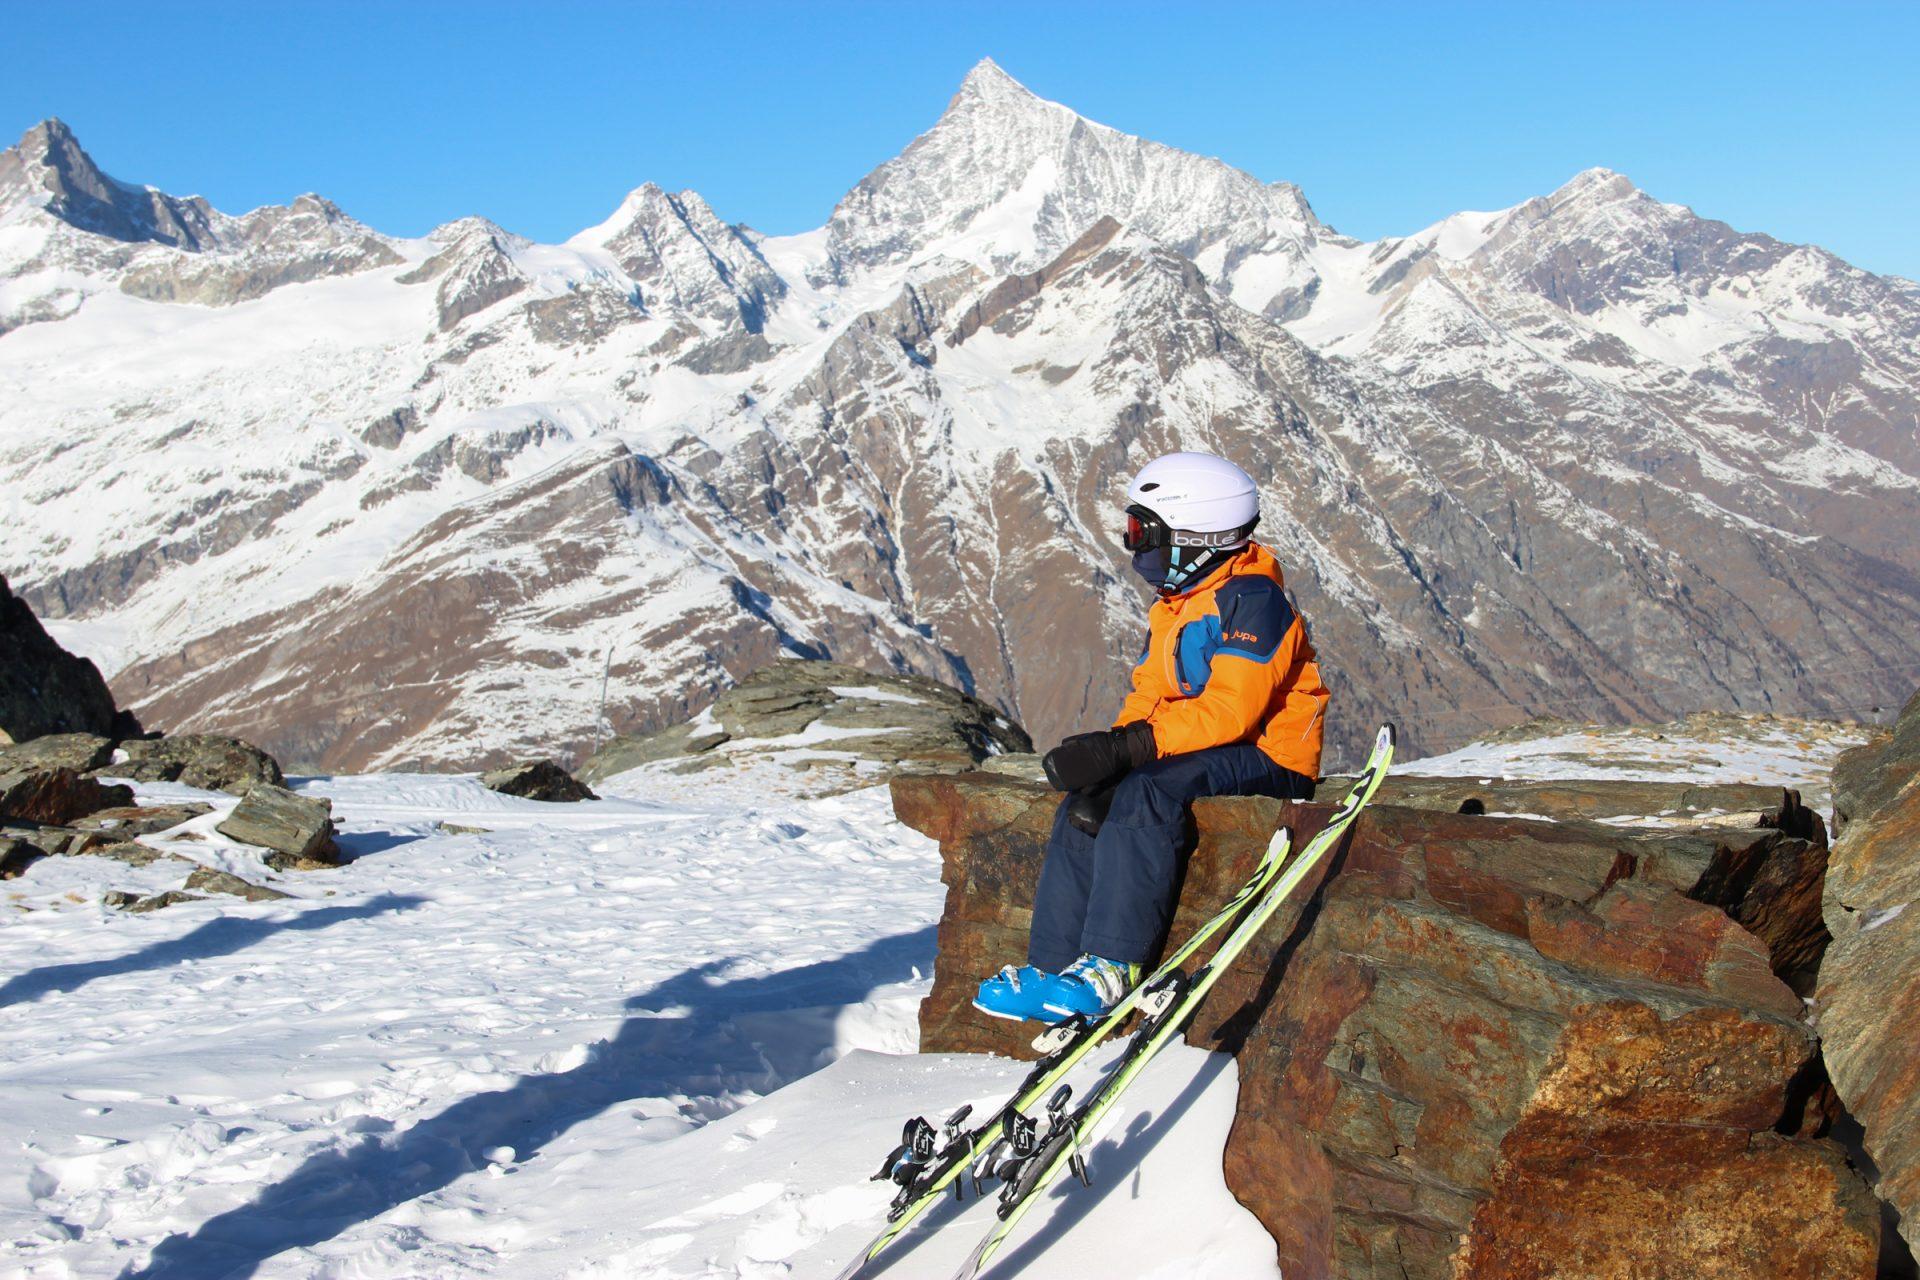 Boy Sitting Next to Skis in Mountains